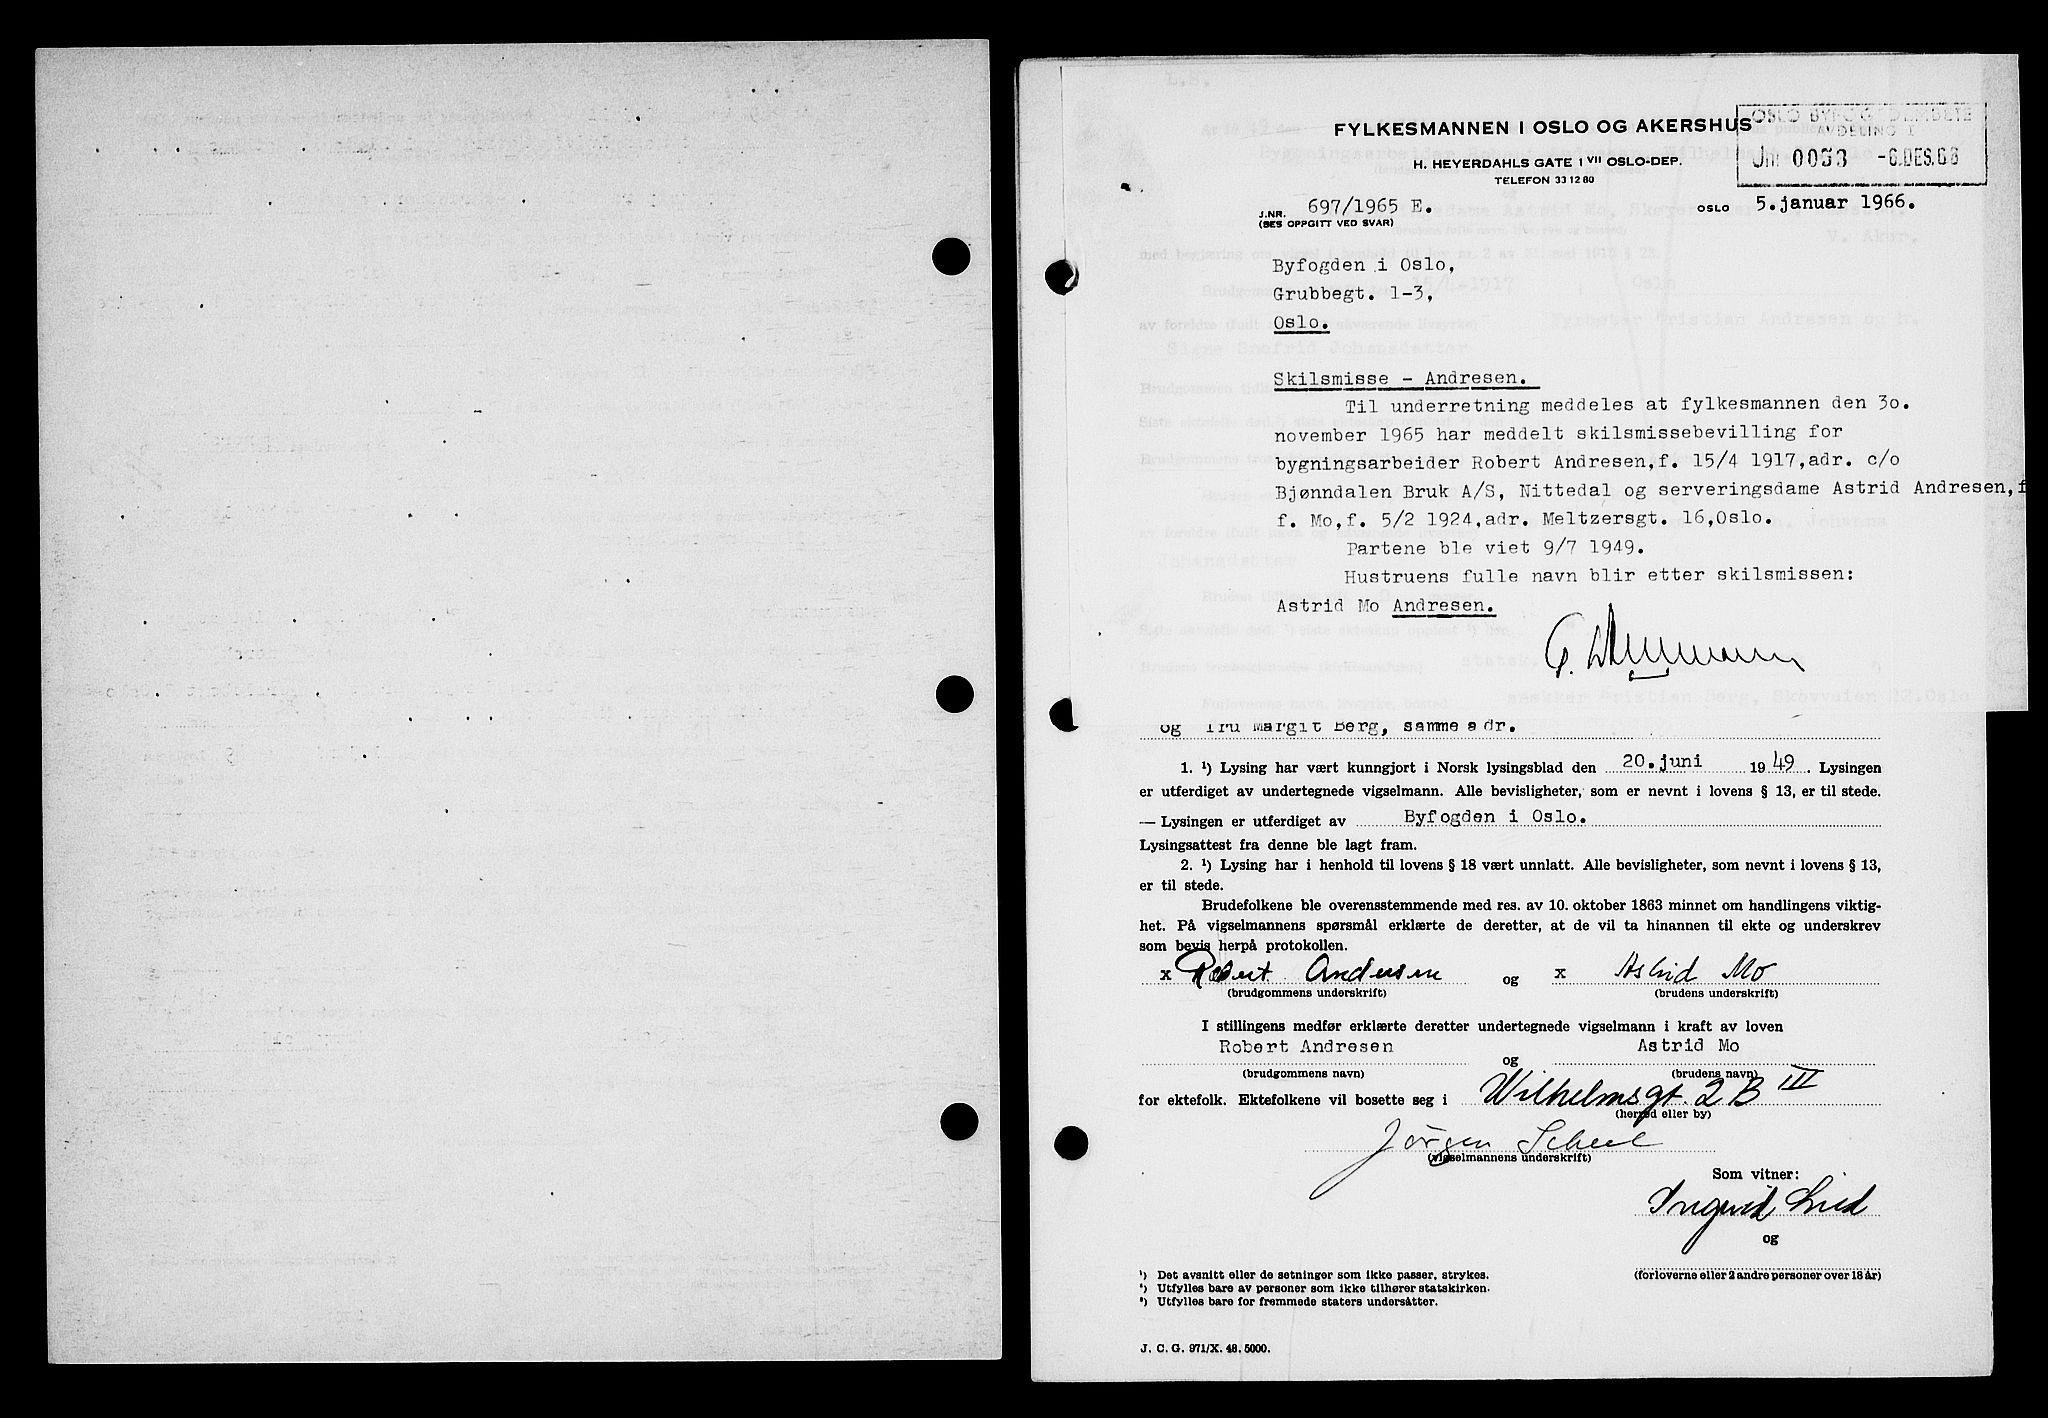 SAO, Oslo byfogd avd. I, L/Lb/Lbb/L0066: Notarialprotokoll, rekke II: Vigsler, 1949, s. upaginert